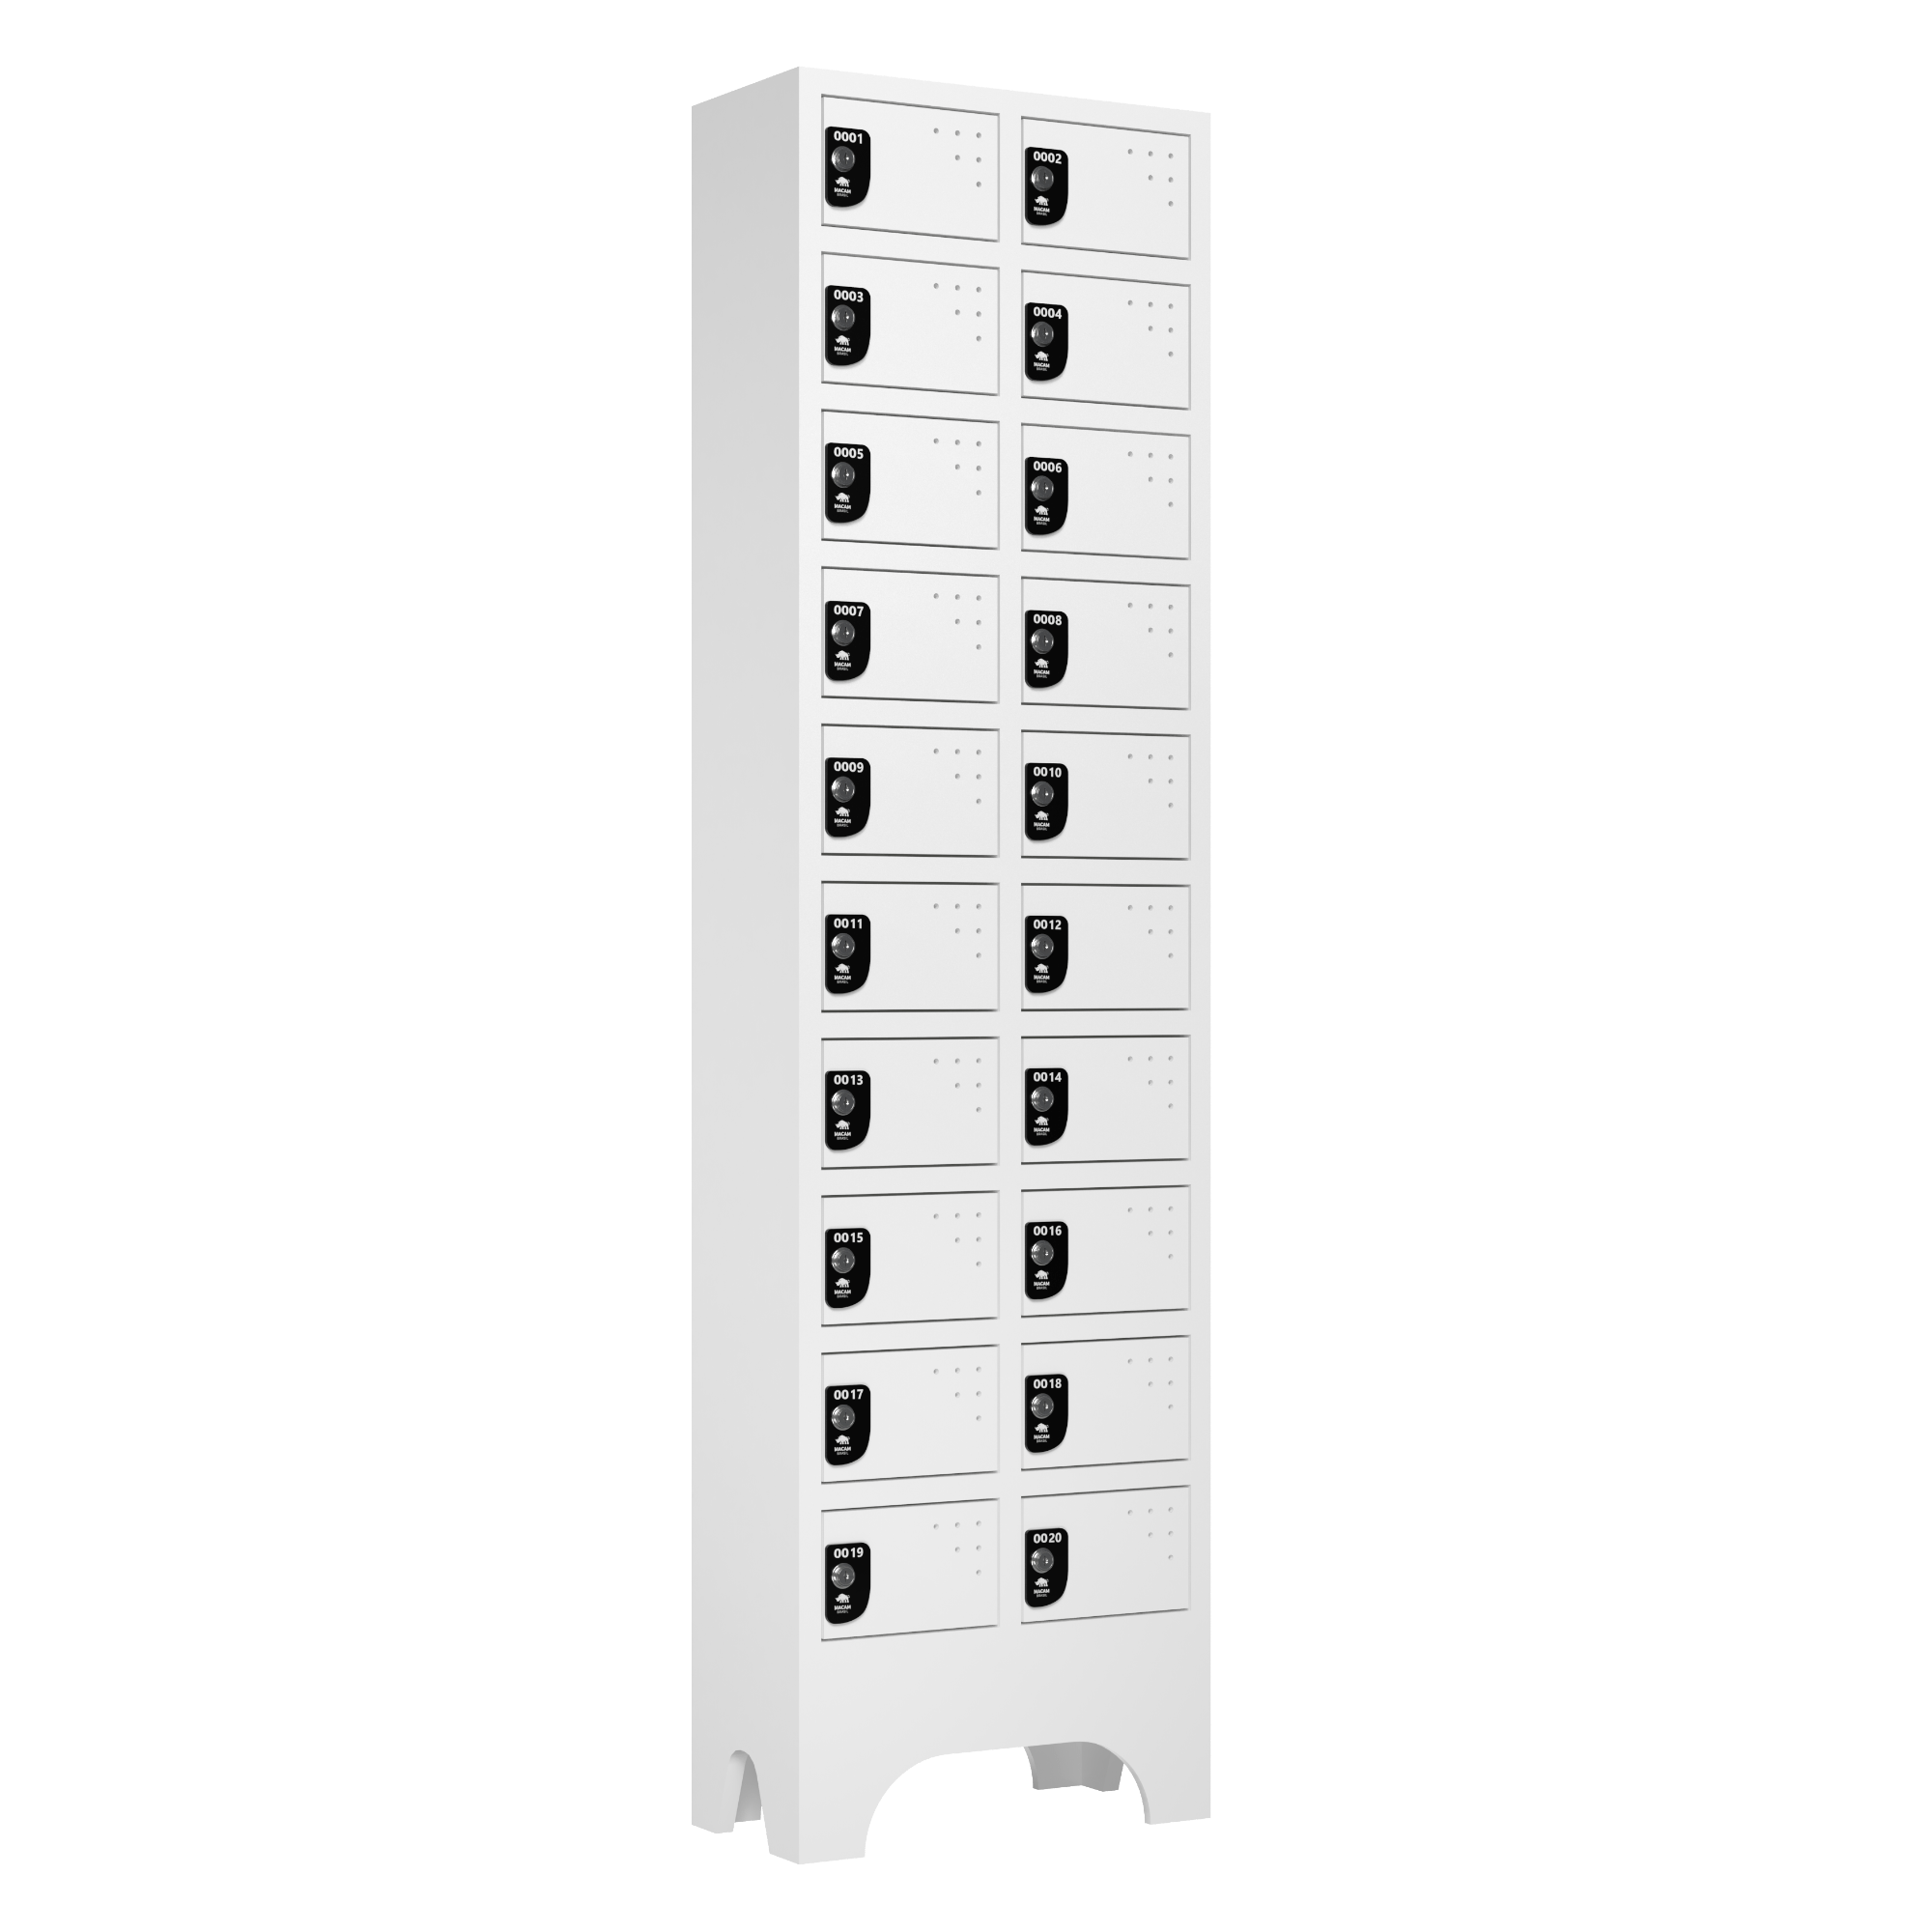 armario para vestiario porta objetos 10 portas por coluna 2 colunas 20 portas 2000x2000 1